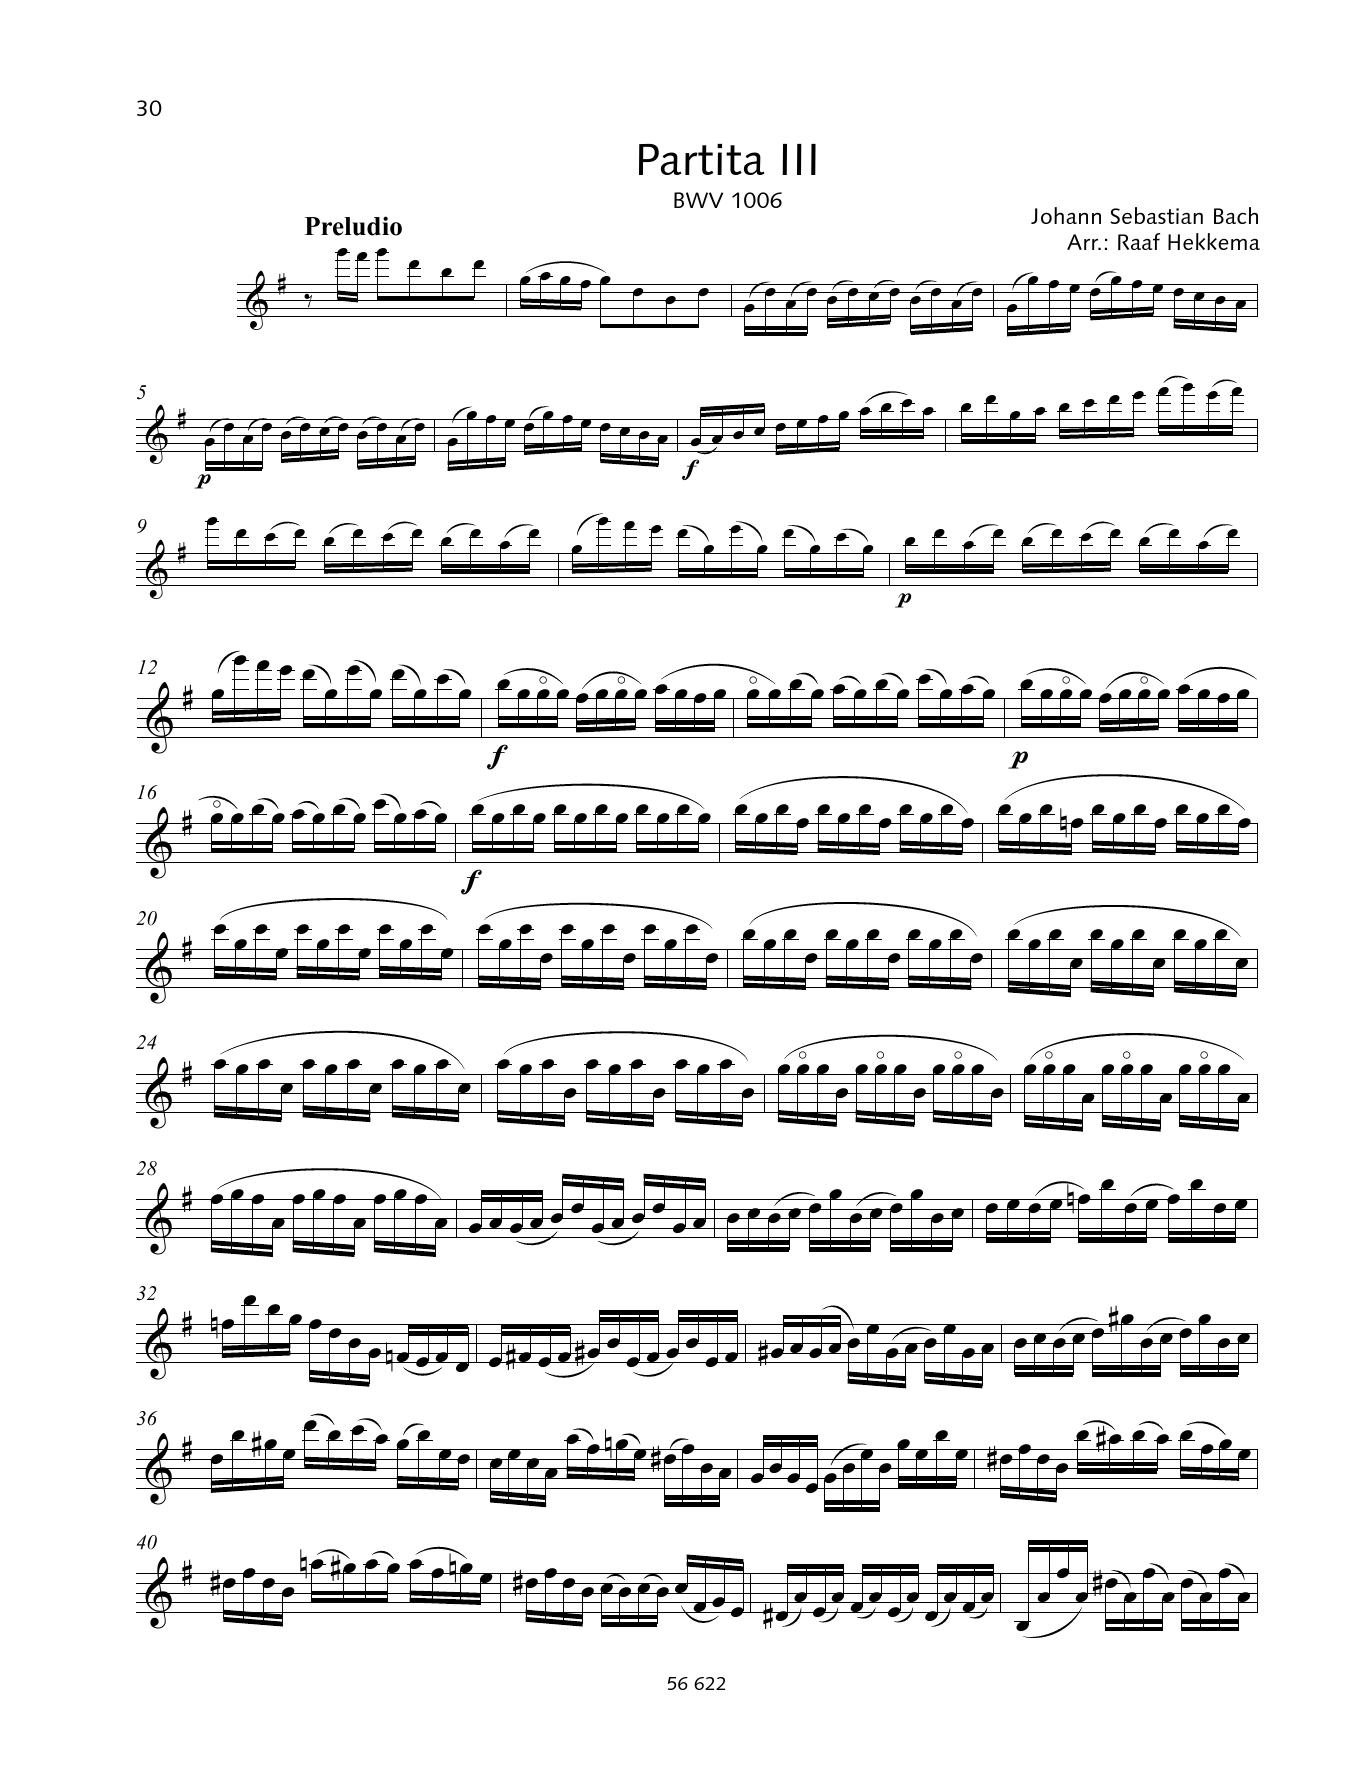 Partita III Sheet Music